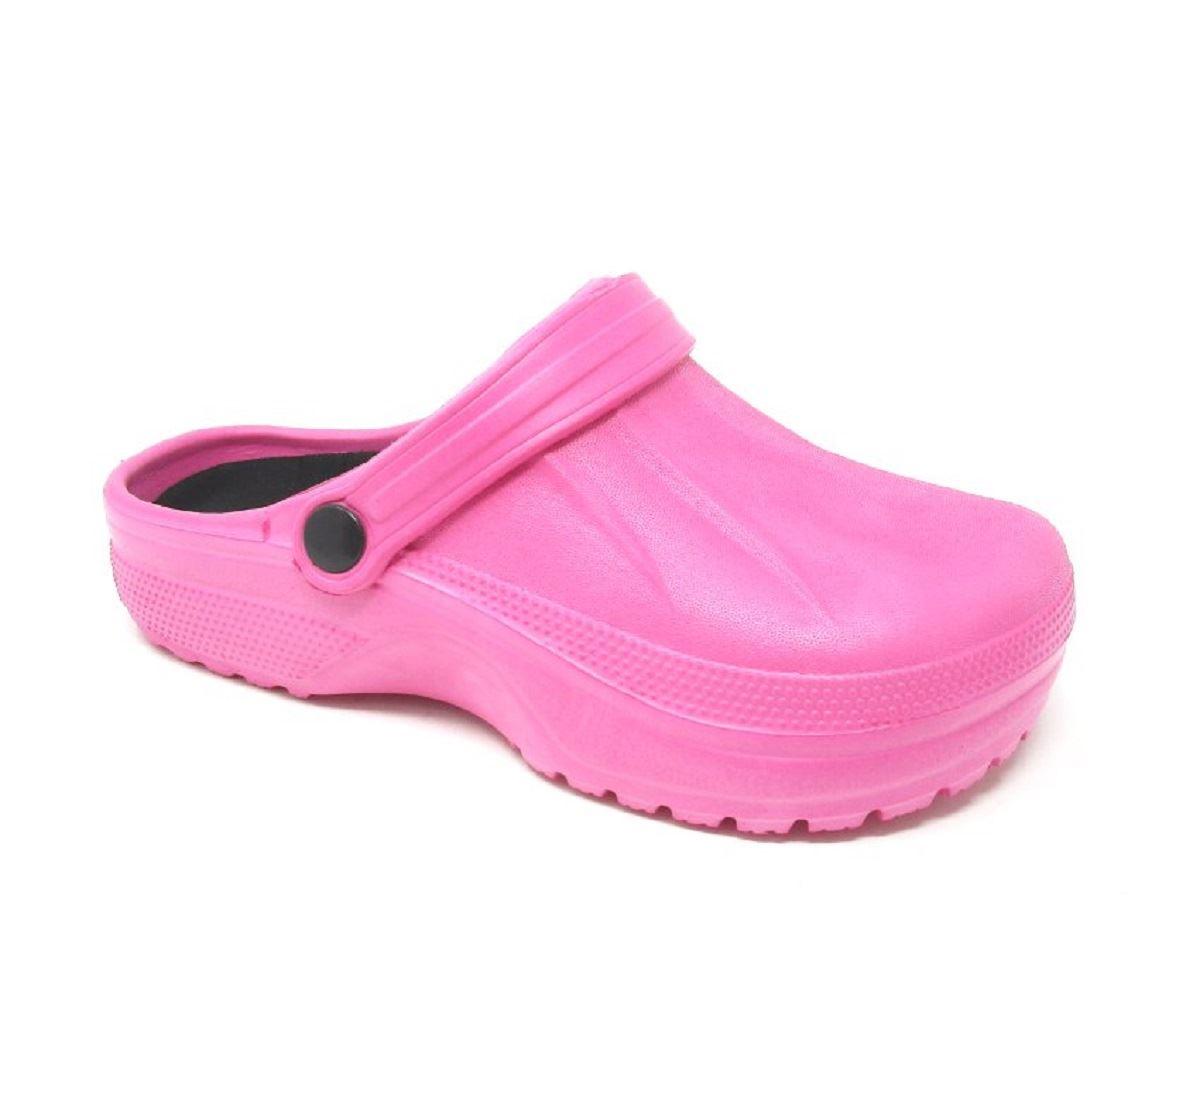 f8f9ab60314ad4 Womens Clogs Mules Slipper Nursing Garden Beach Sandals Hospital Rubber  Shoes